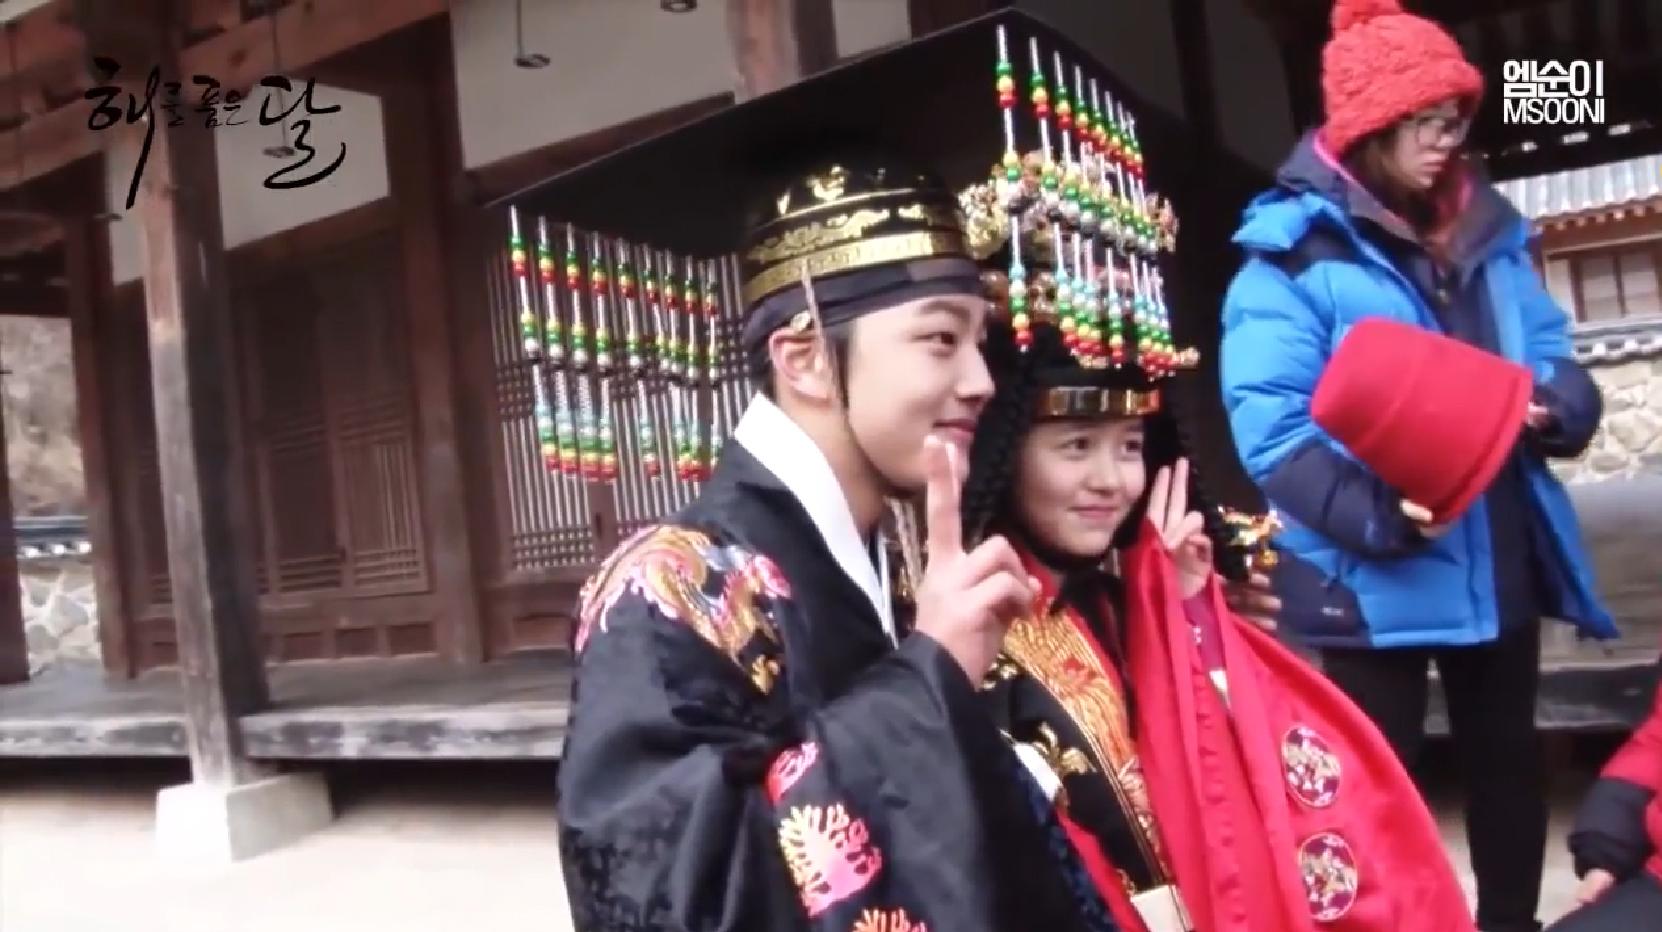 yeo jingoo, kim sohyun, yeo jingoo profile, kim sohyun profile, yeo jingoo kim sohyun, kpop couple. k celeb ship, kpop ship